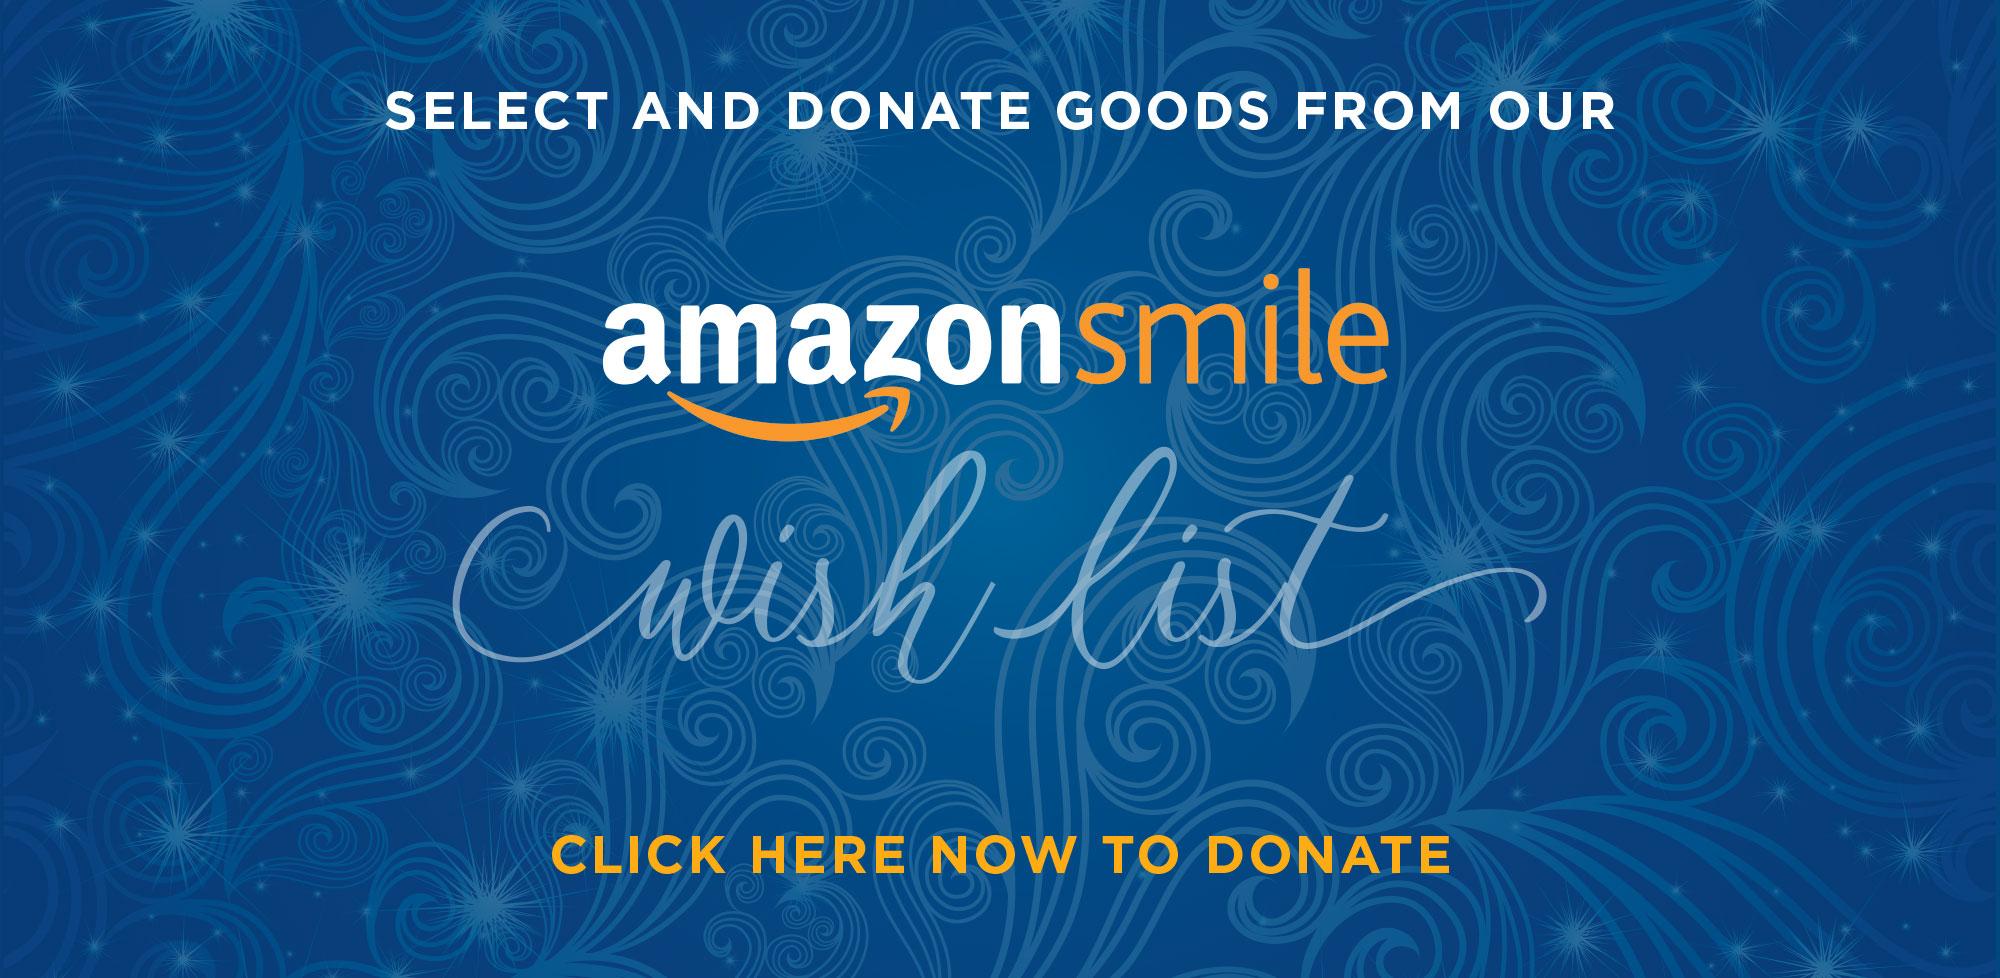 UVBH20 Amazon Smile Wish List